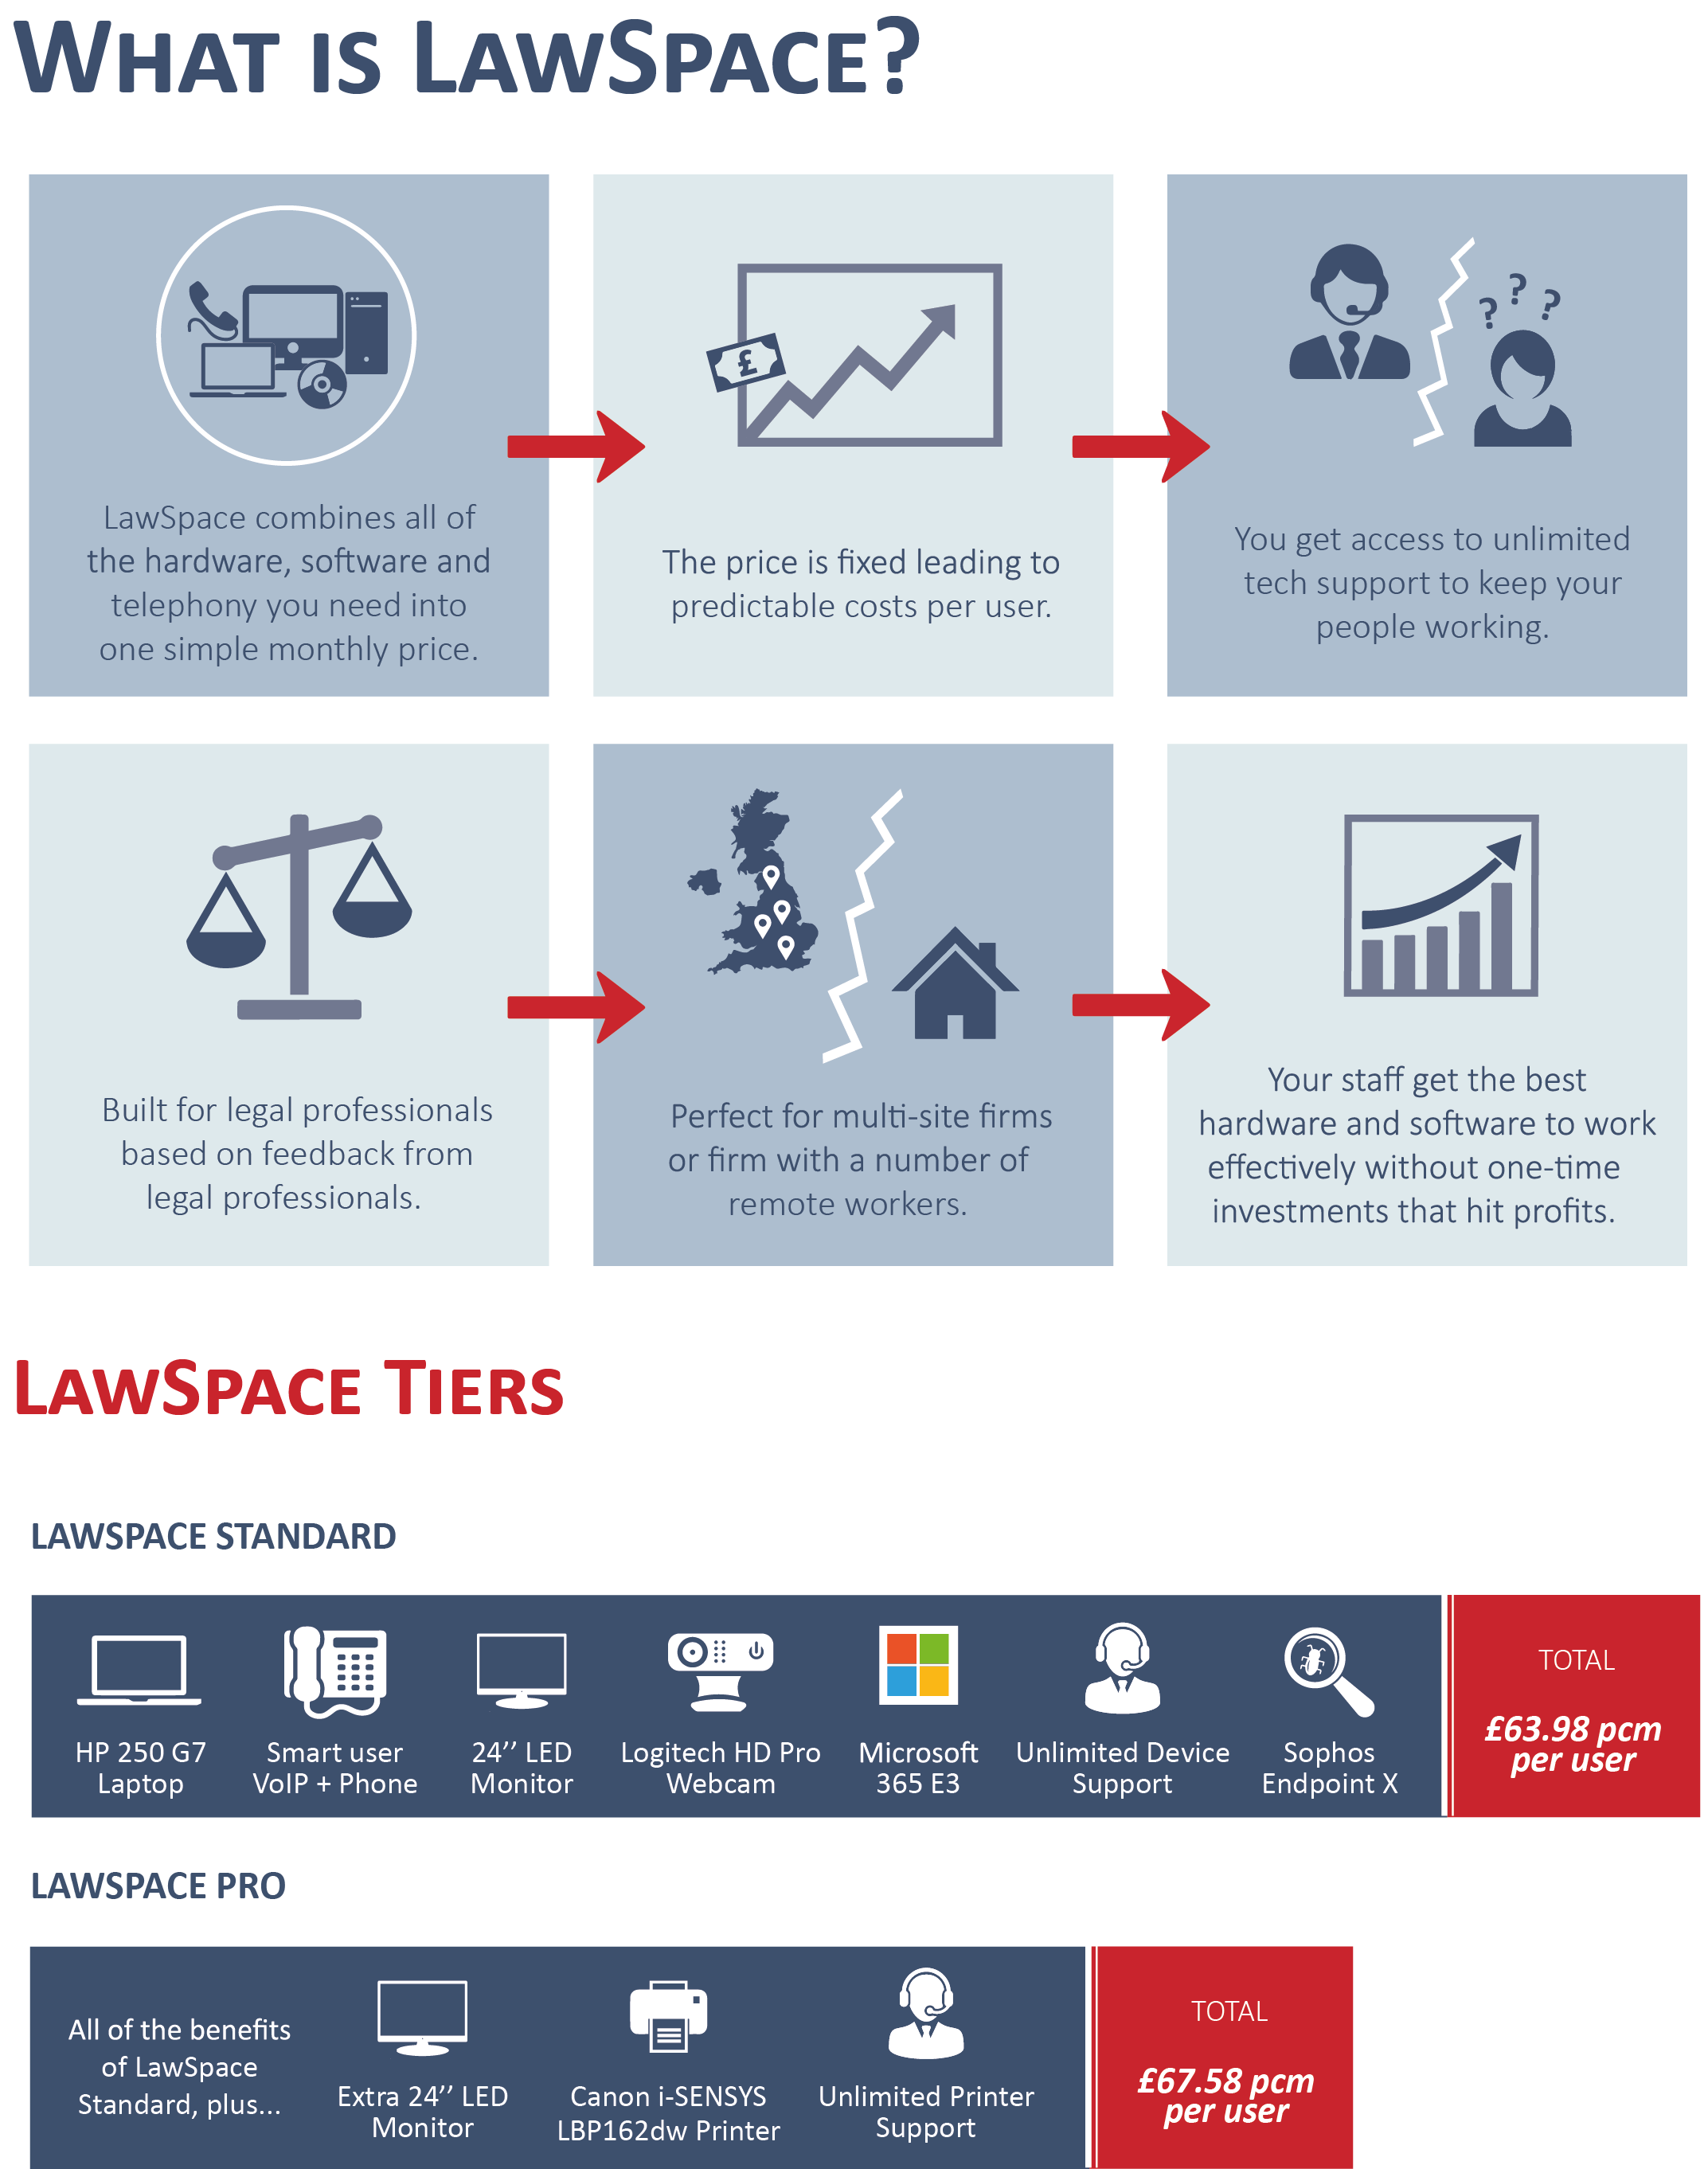 Lawspace